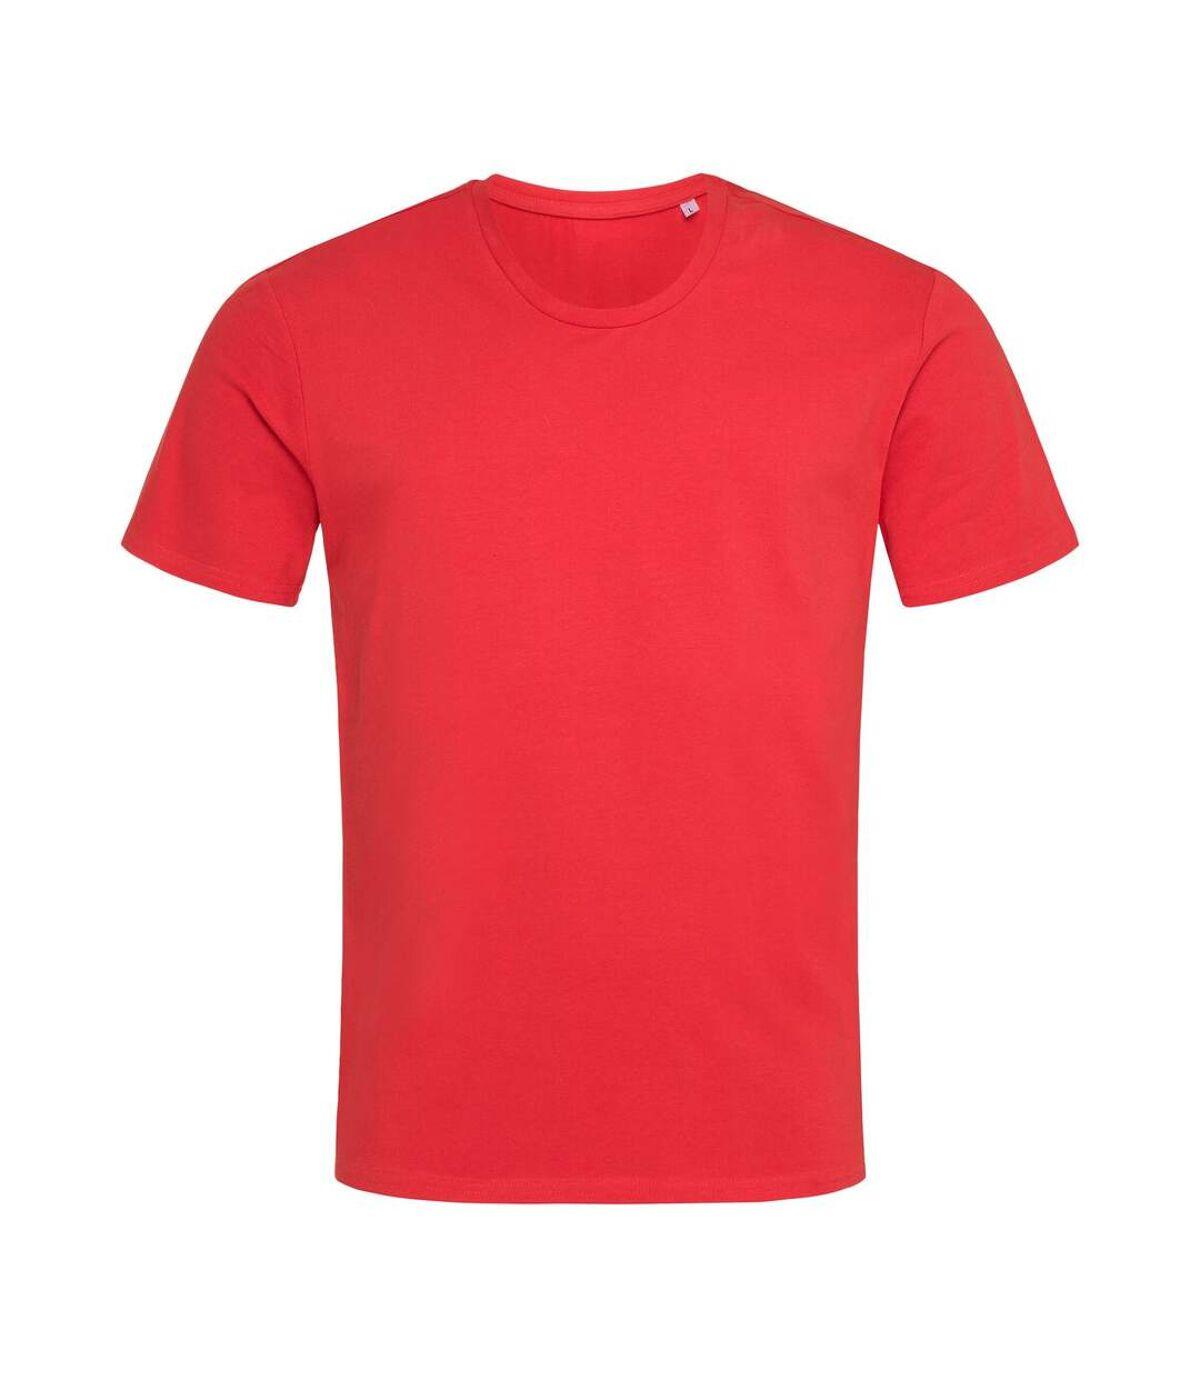 Stedman Mens Stars T-Shirt (Scarlet Red) - UTAB468